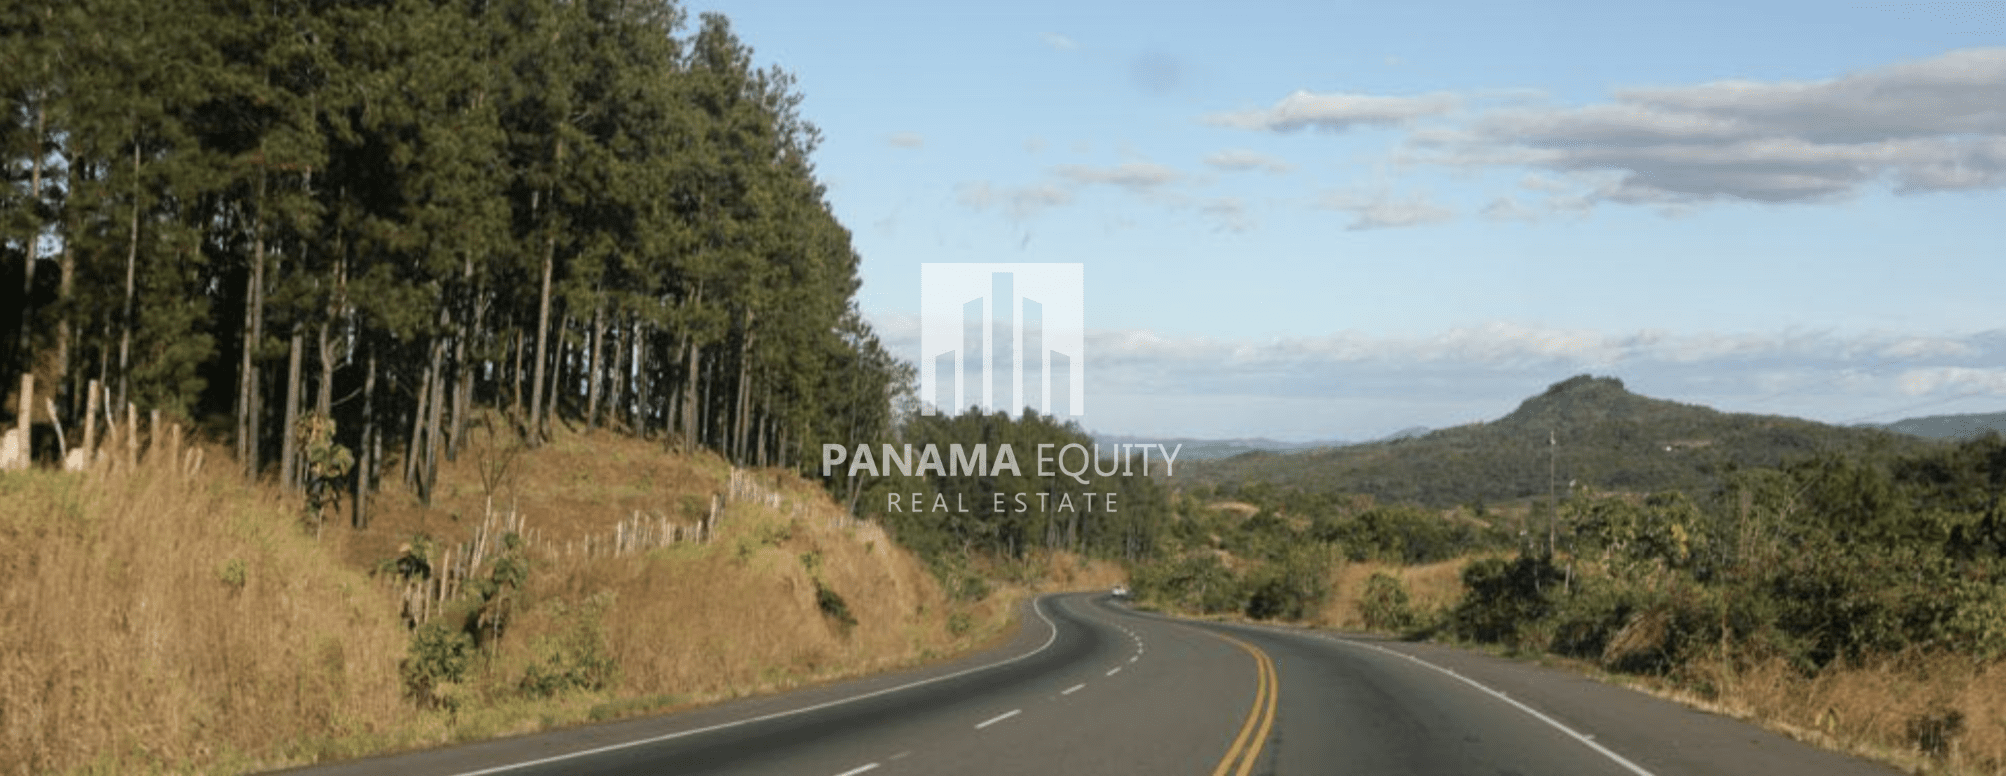 winding-road-in-mountains-coronado